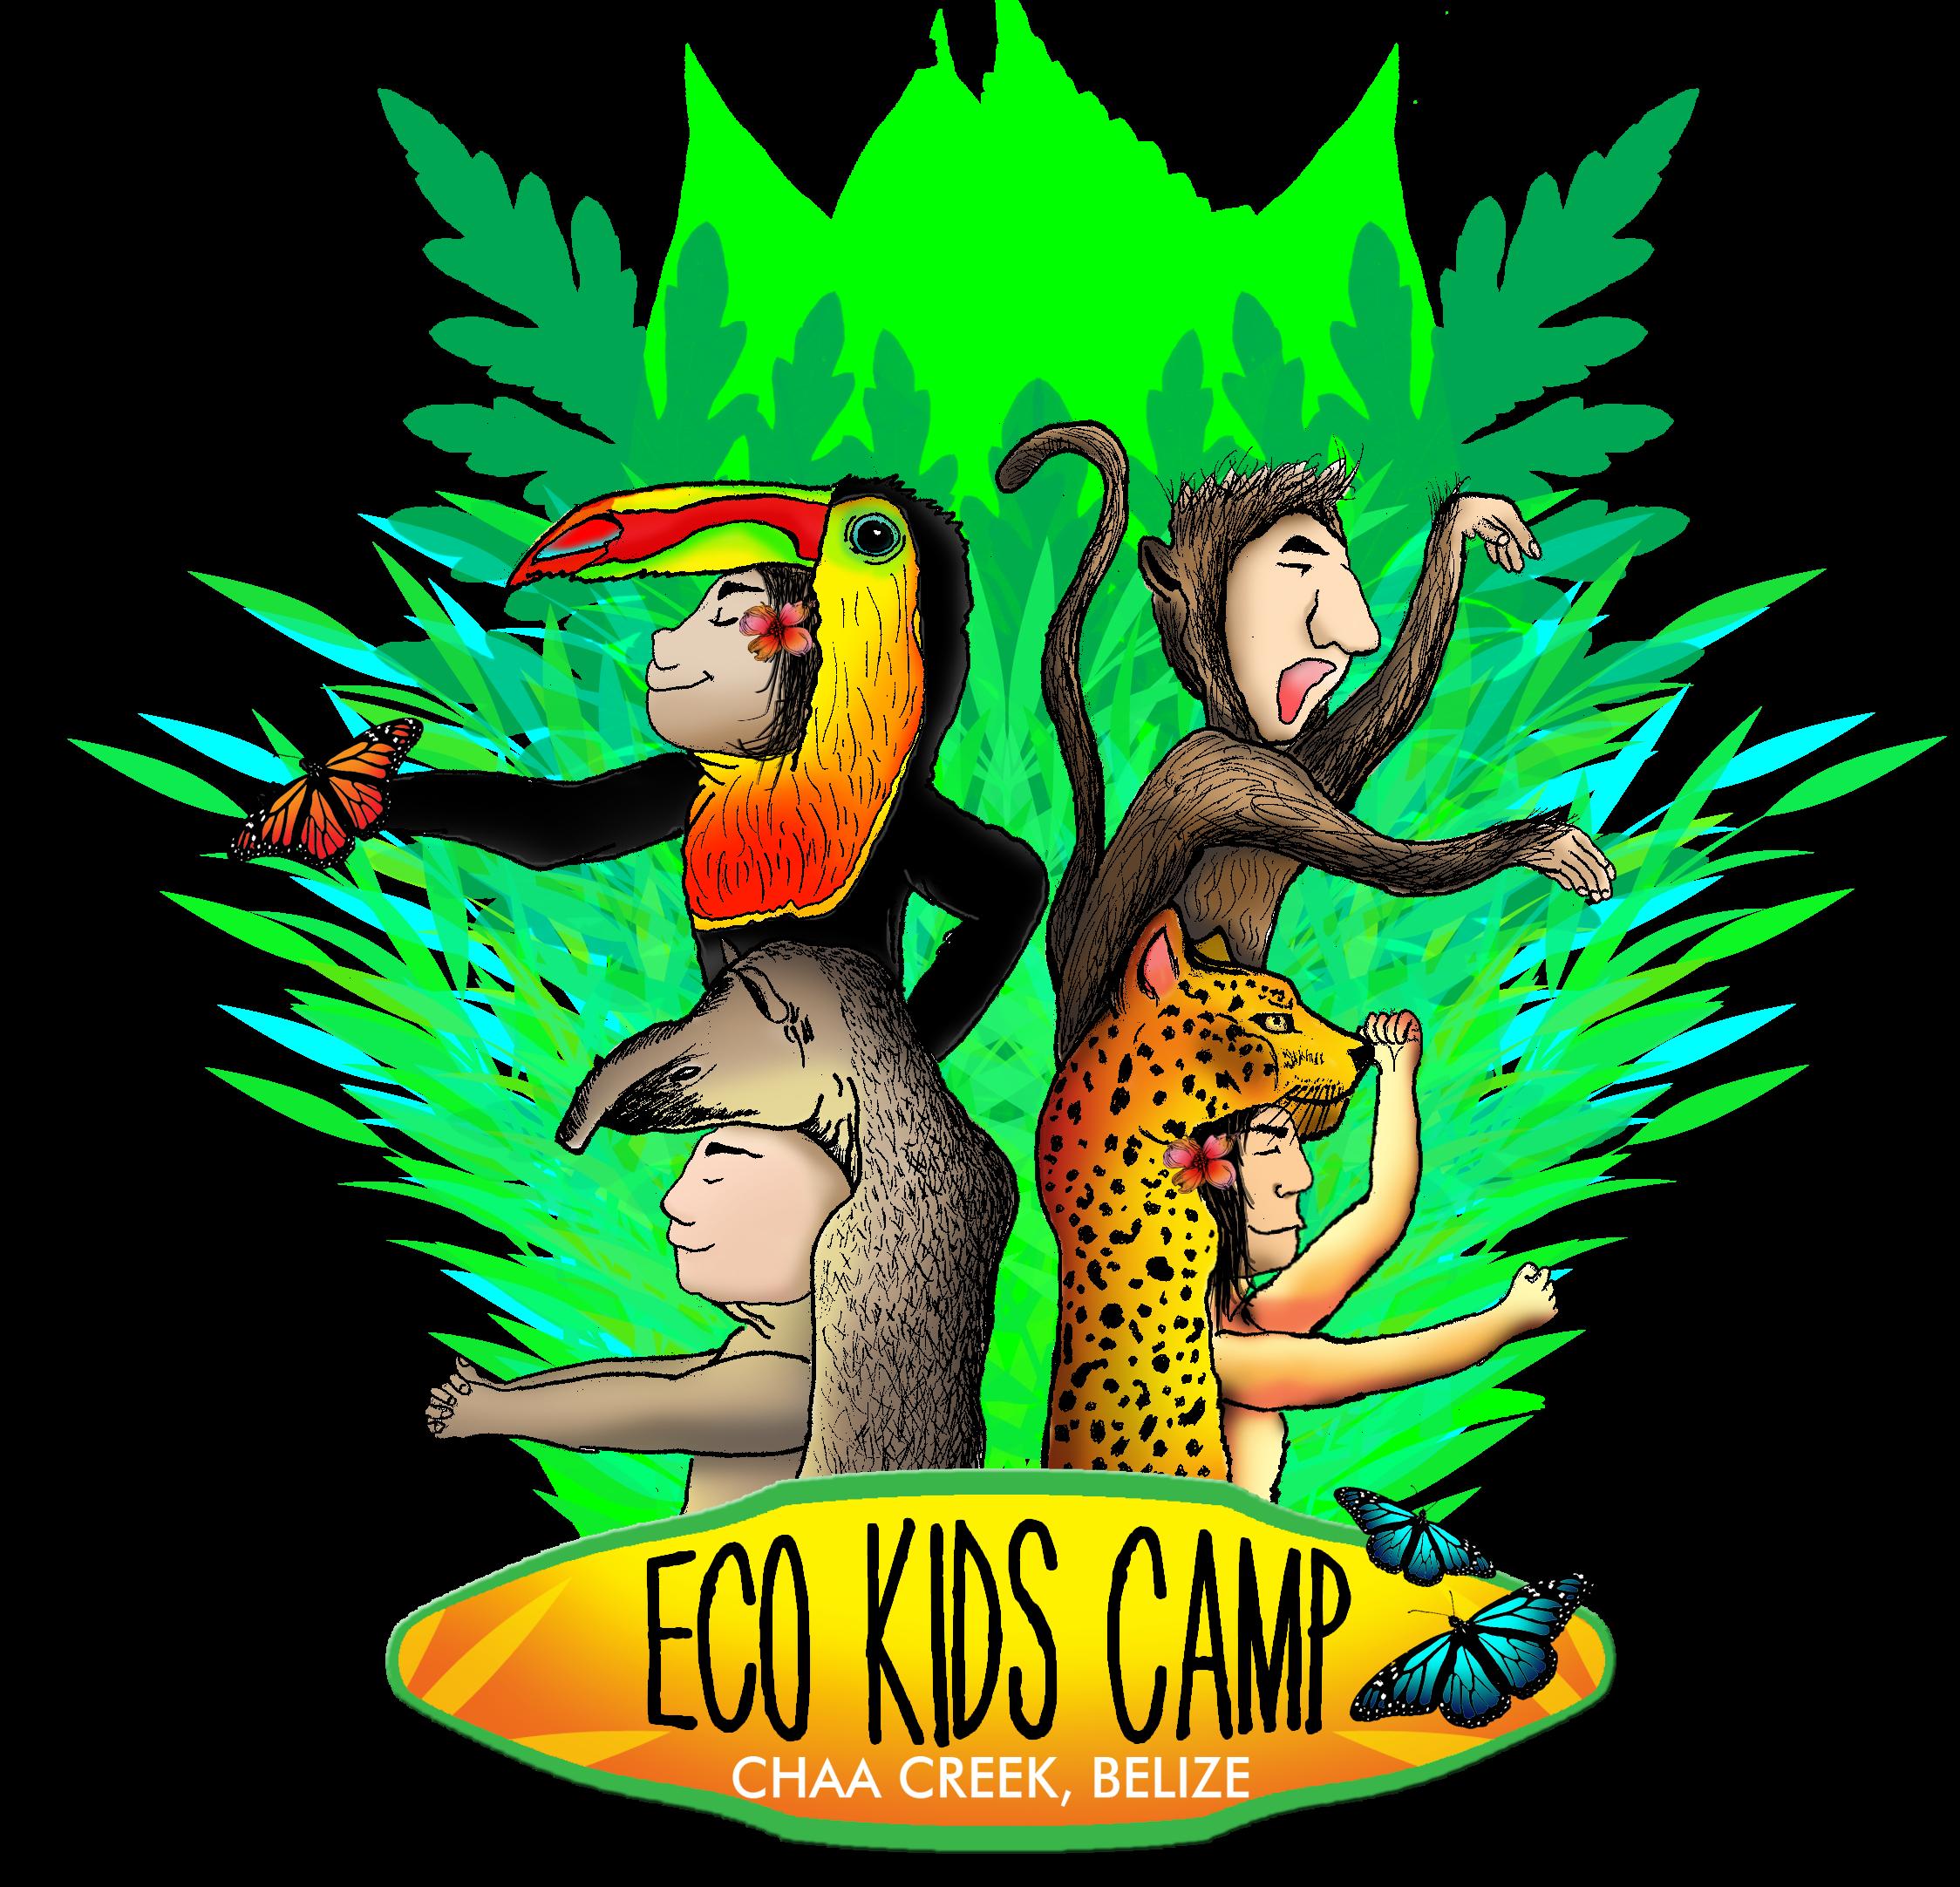 Chaa Creek's Eco Kids Set for Educational Adventure